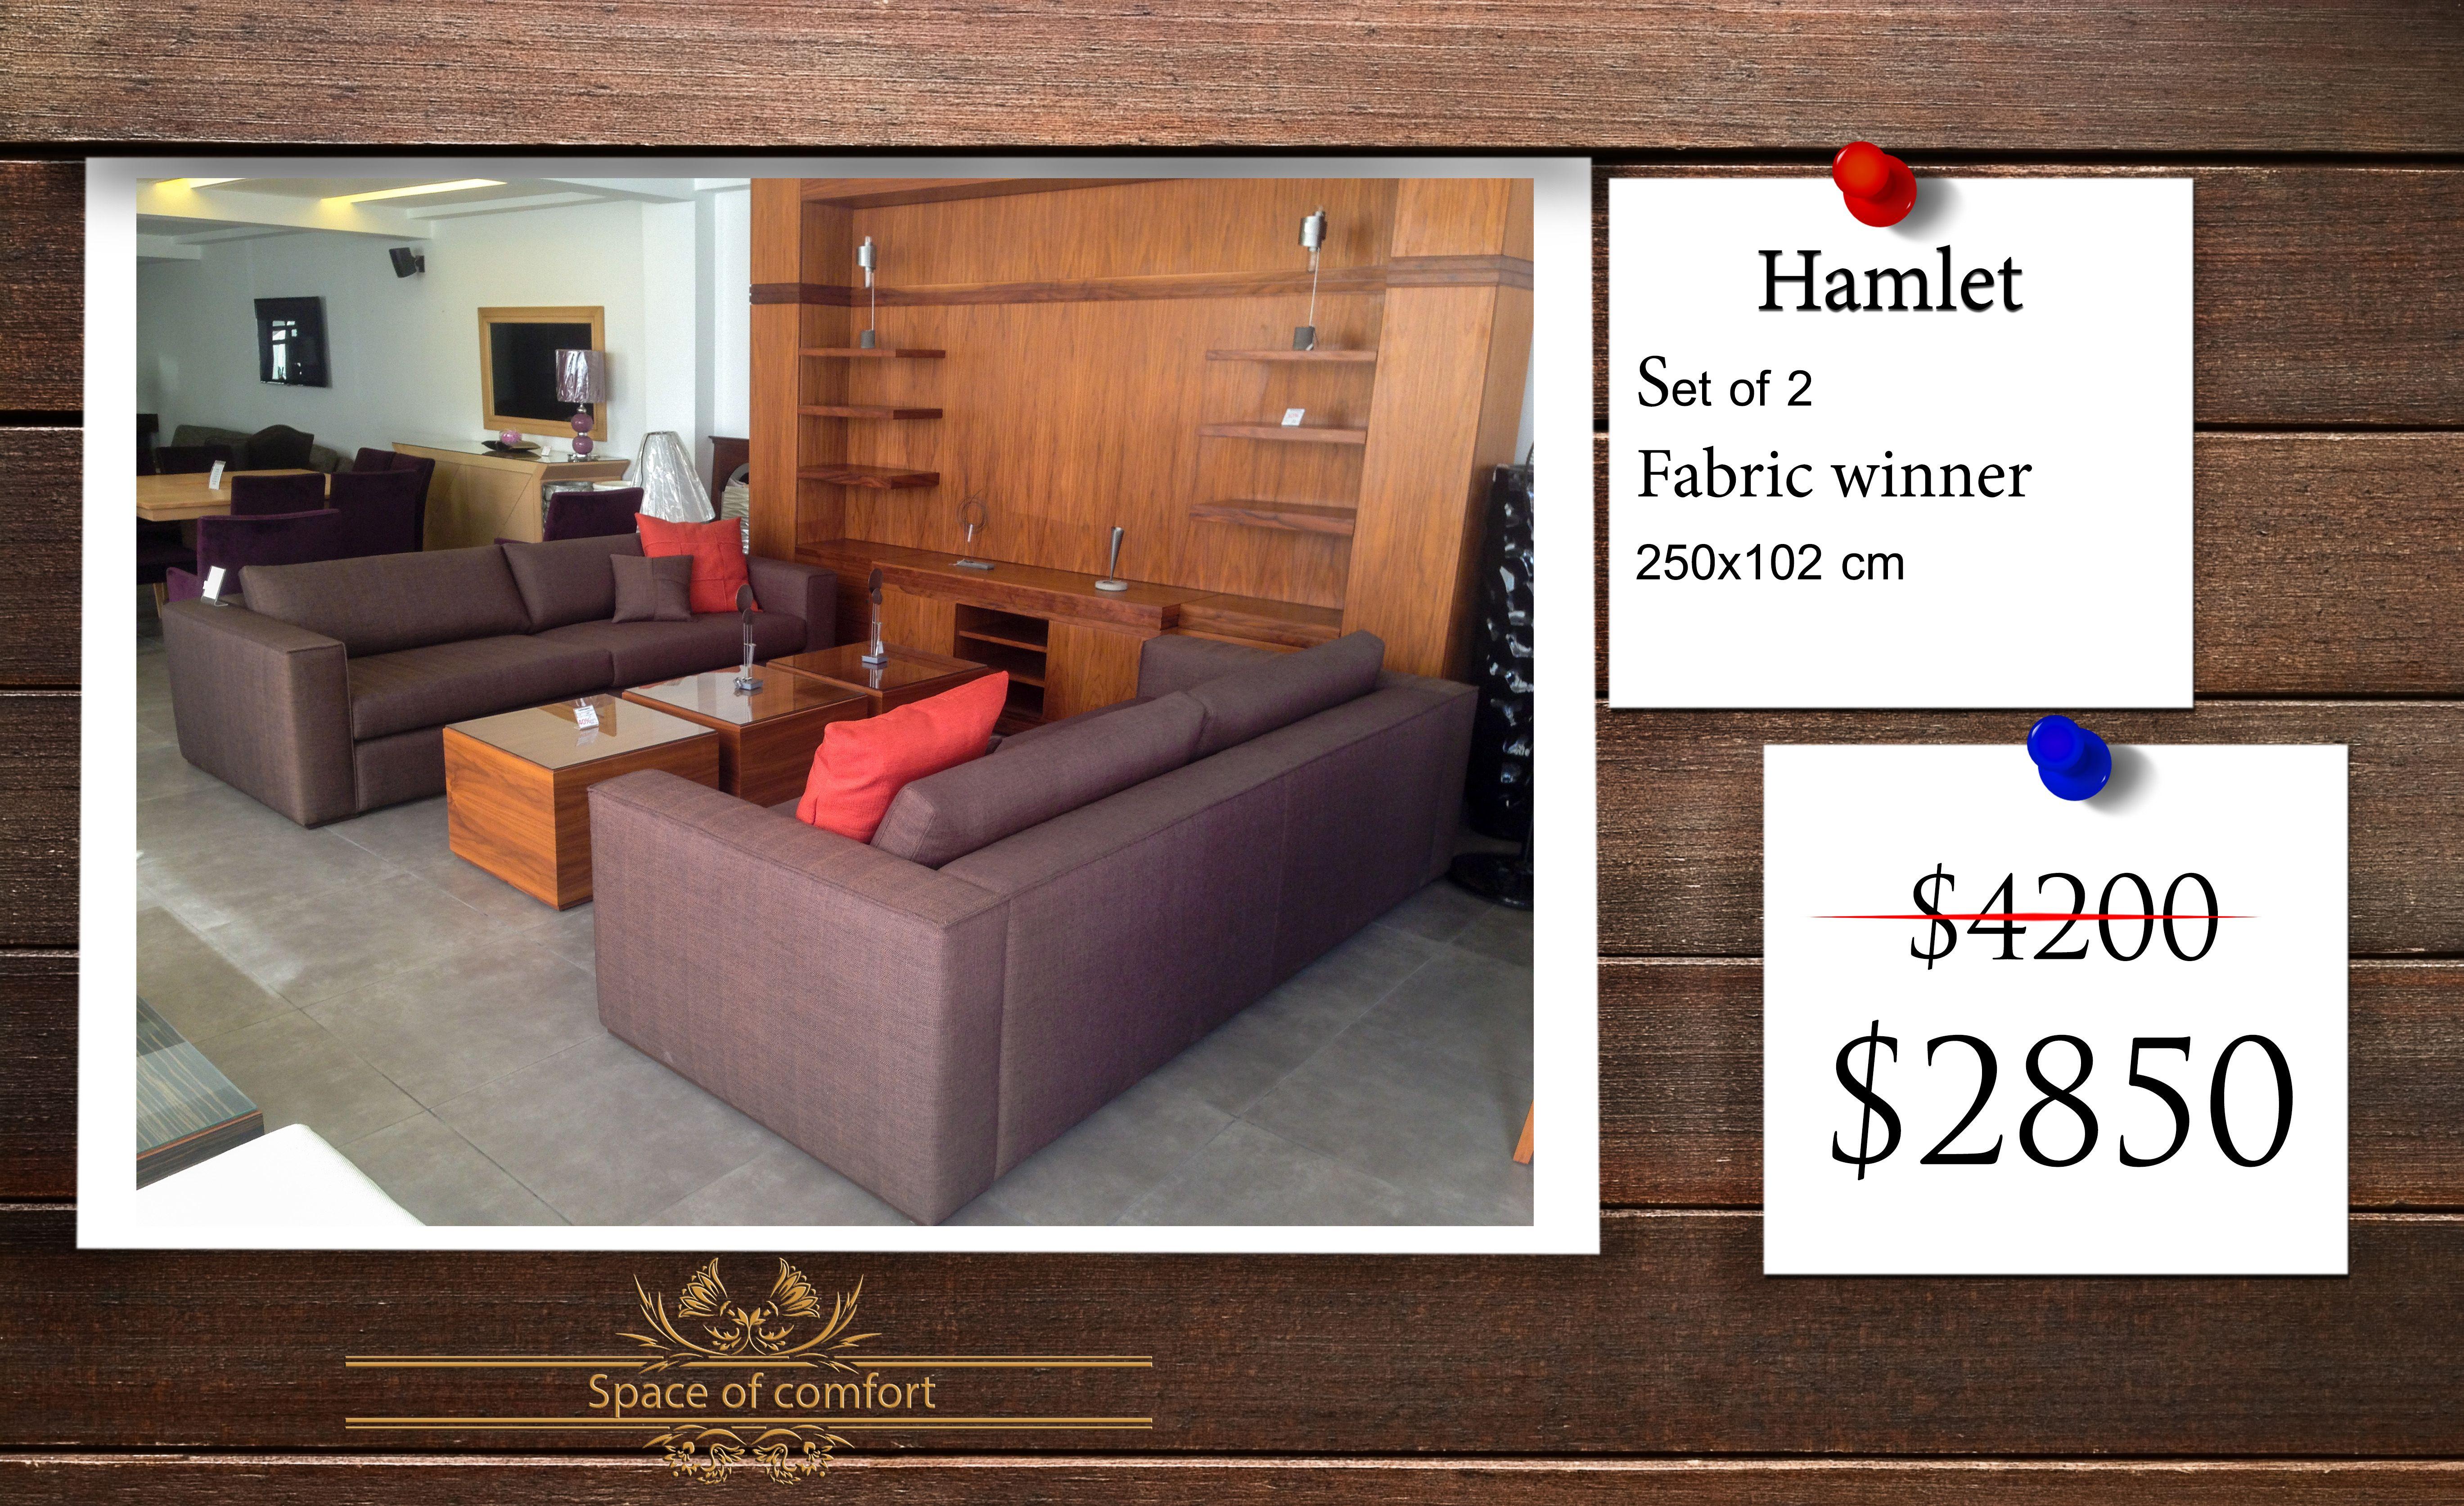 Model Hamlet Furniture Type Sofa Set 2 Sofas Demensions 250x102cm Material Fabric Winner Price Was 4200 Now 2850 Sofa Sofa Set Furniture